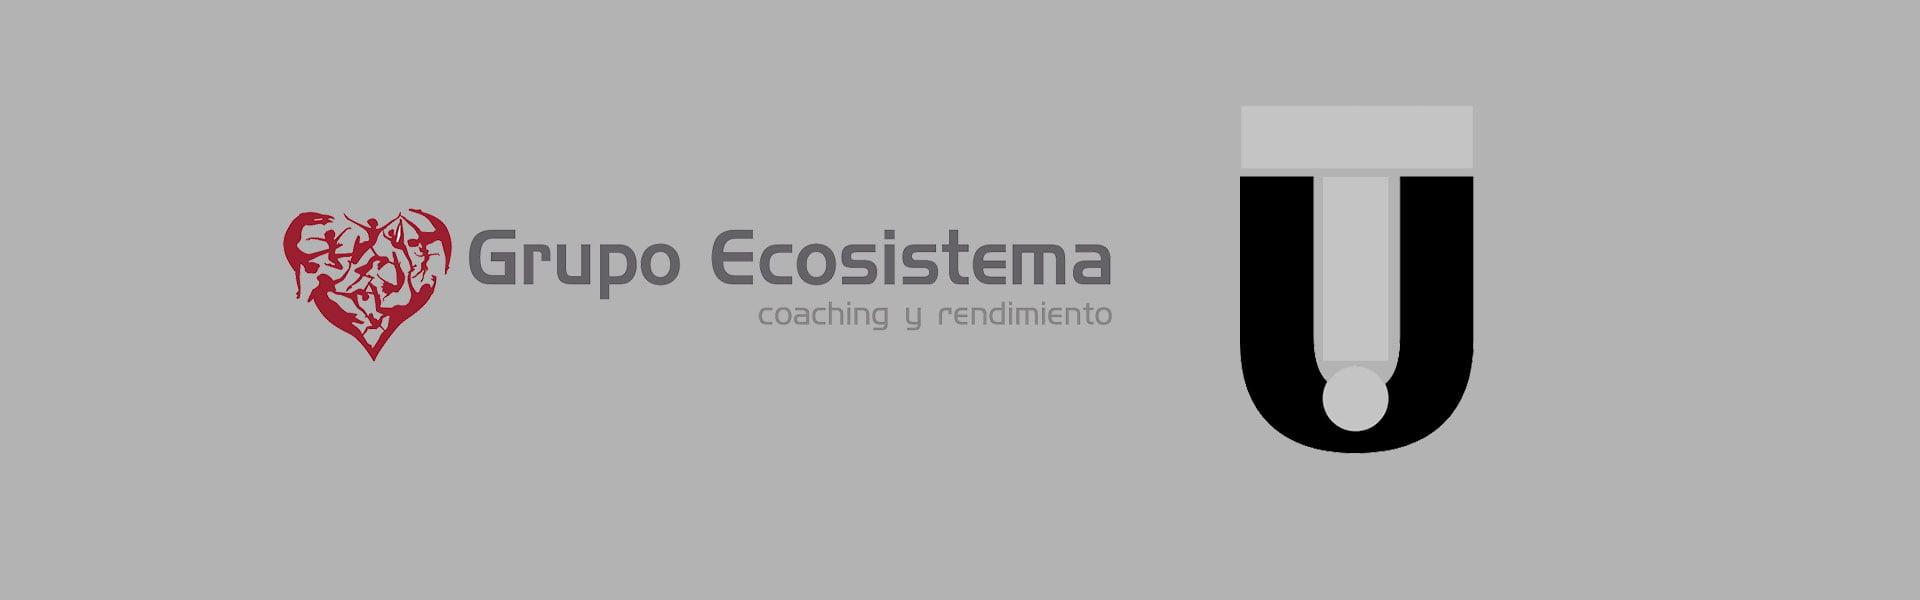 entrevista coach tuio sport